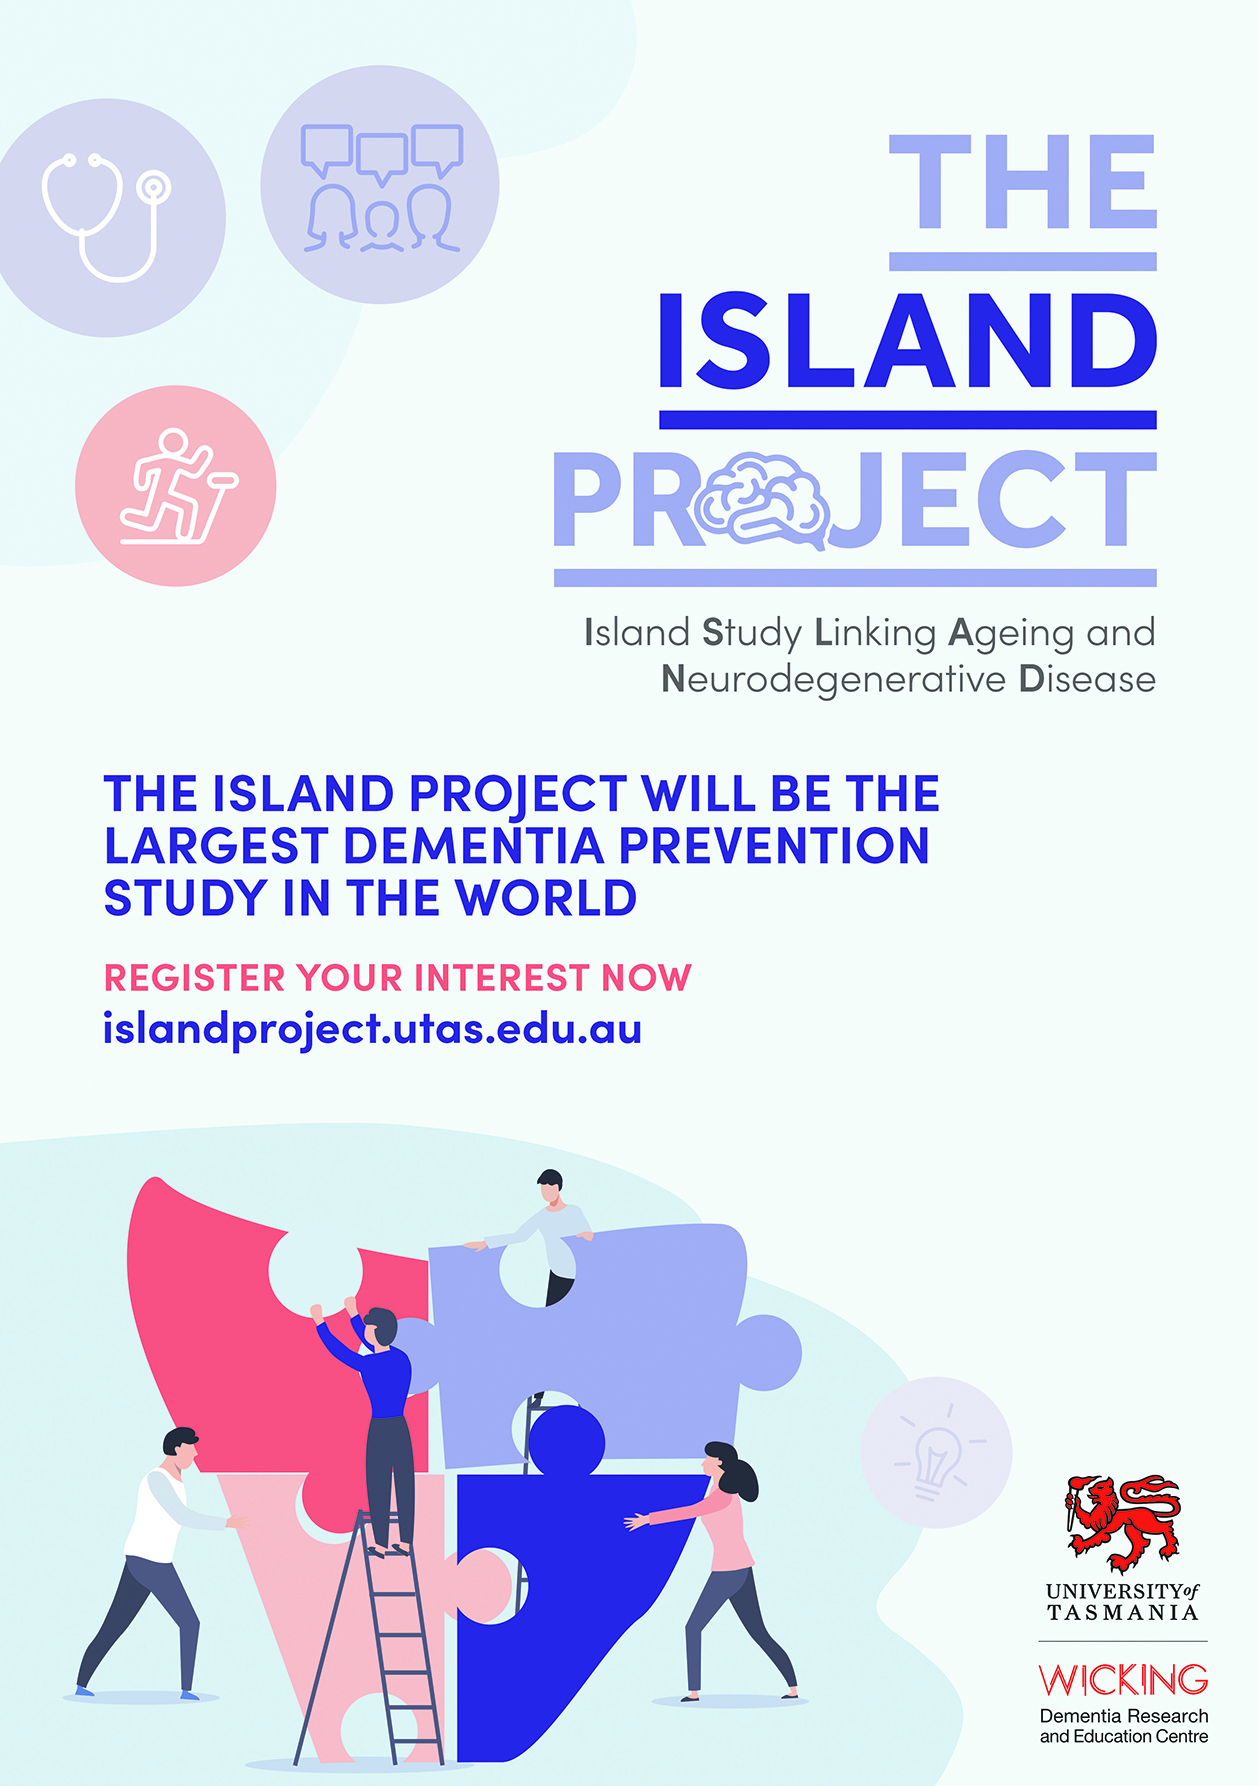 web_2019_08_08_Island_project.jpg